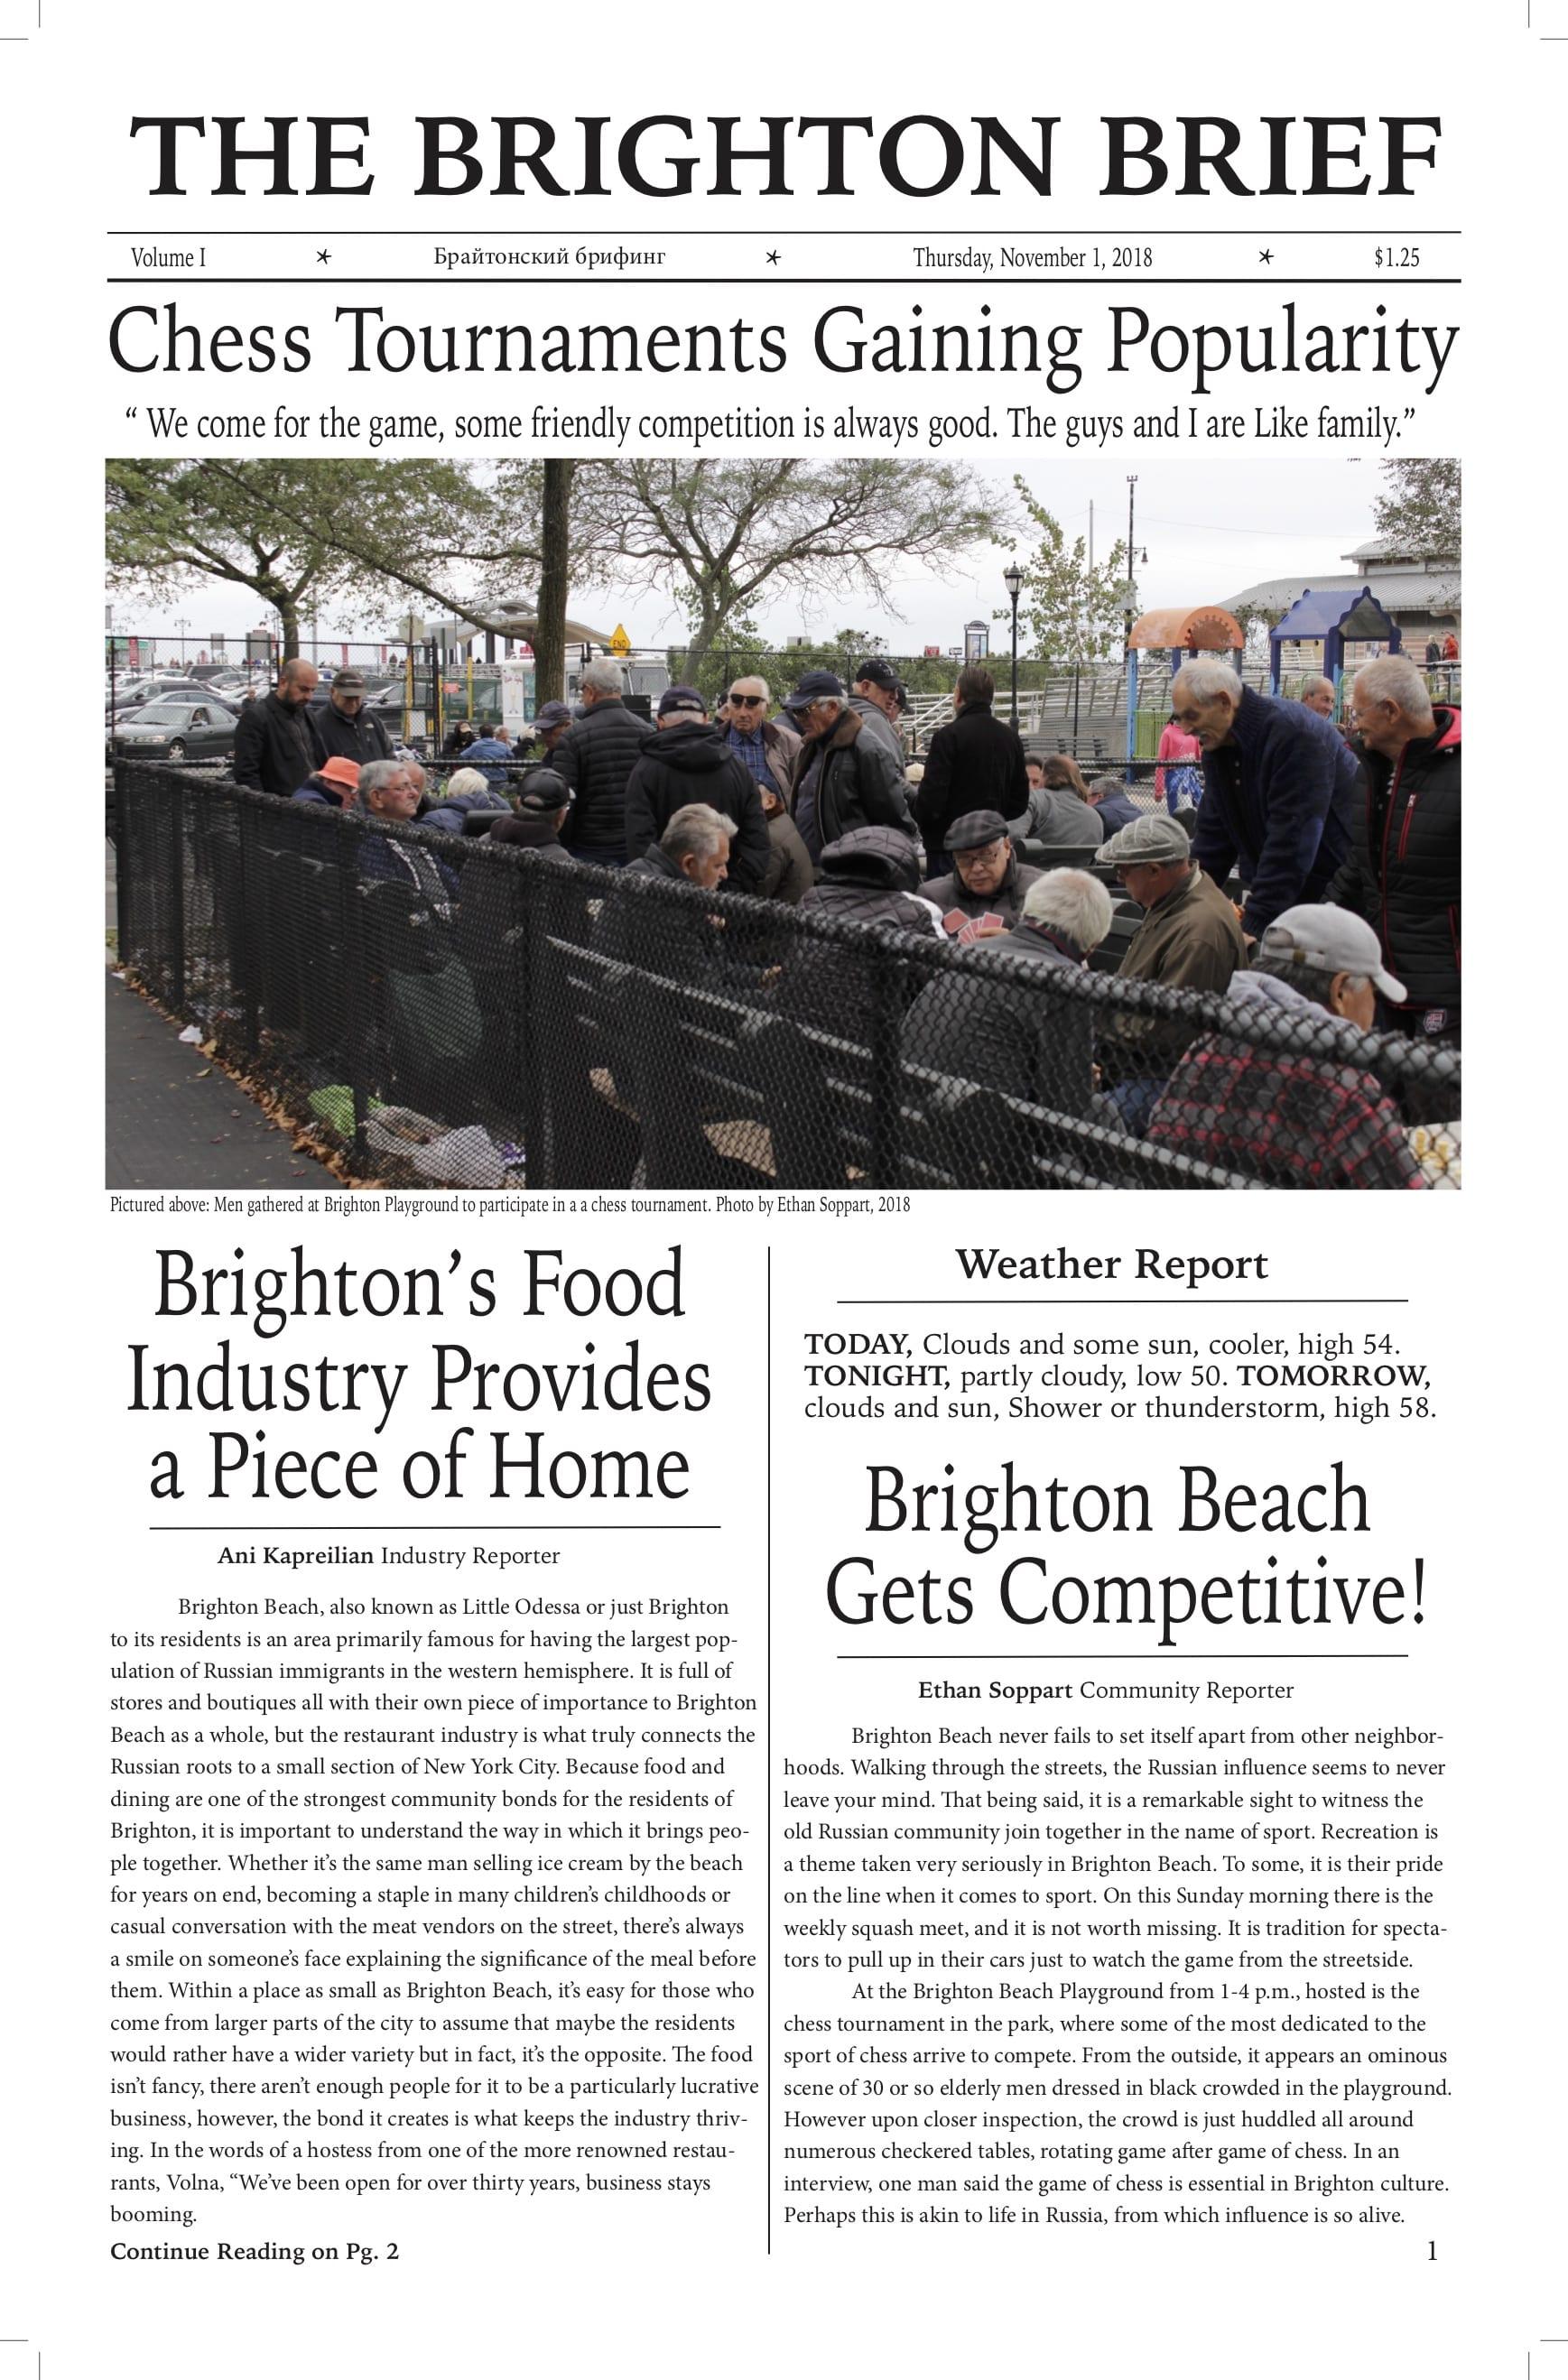 Bridge 3 Newsprint The Brighton Brief